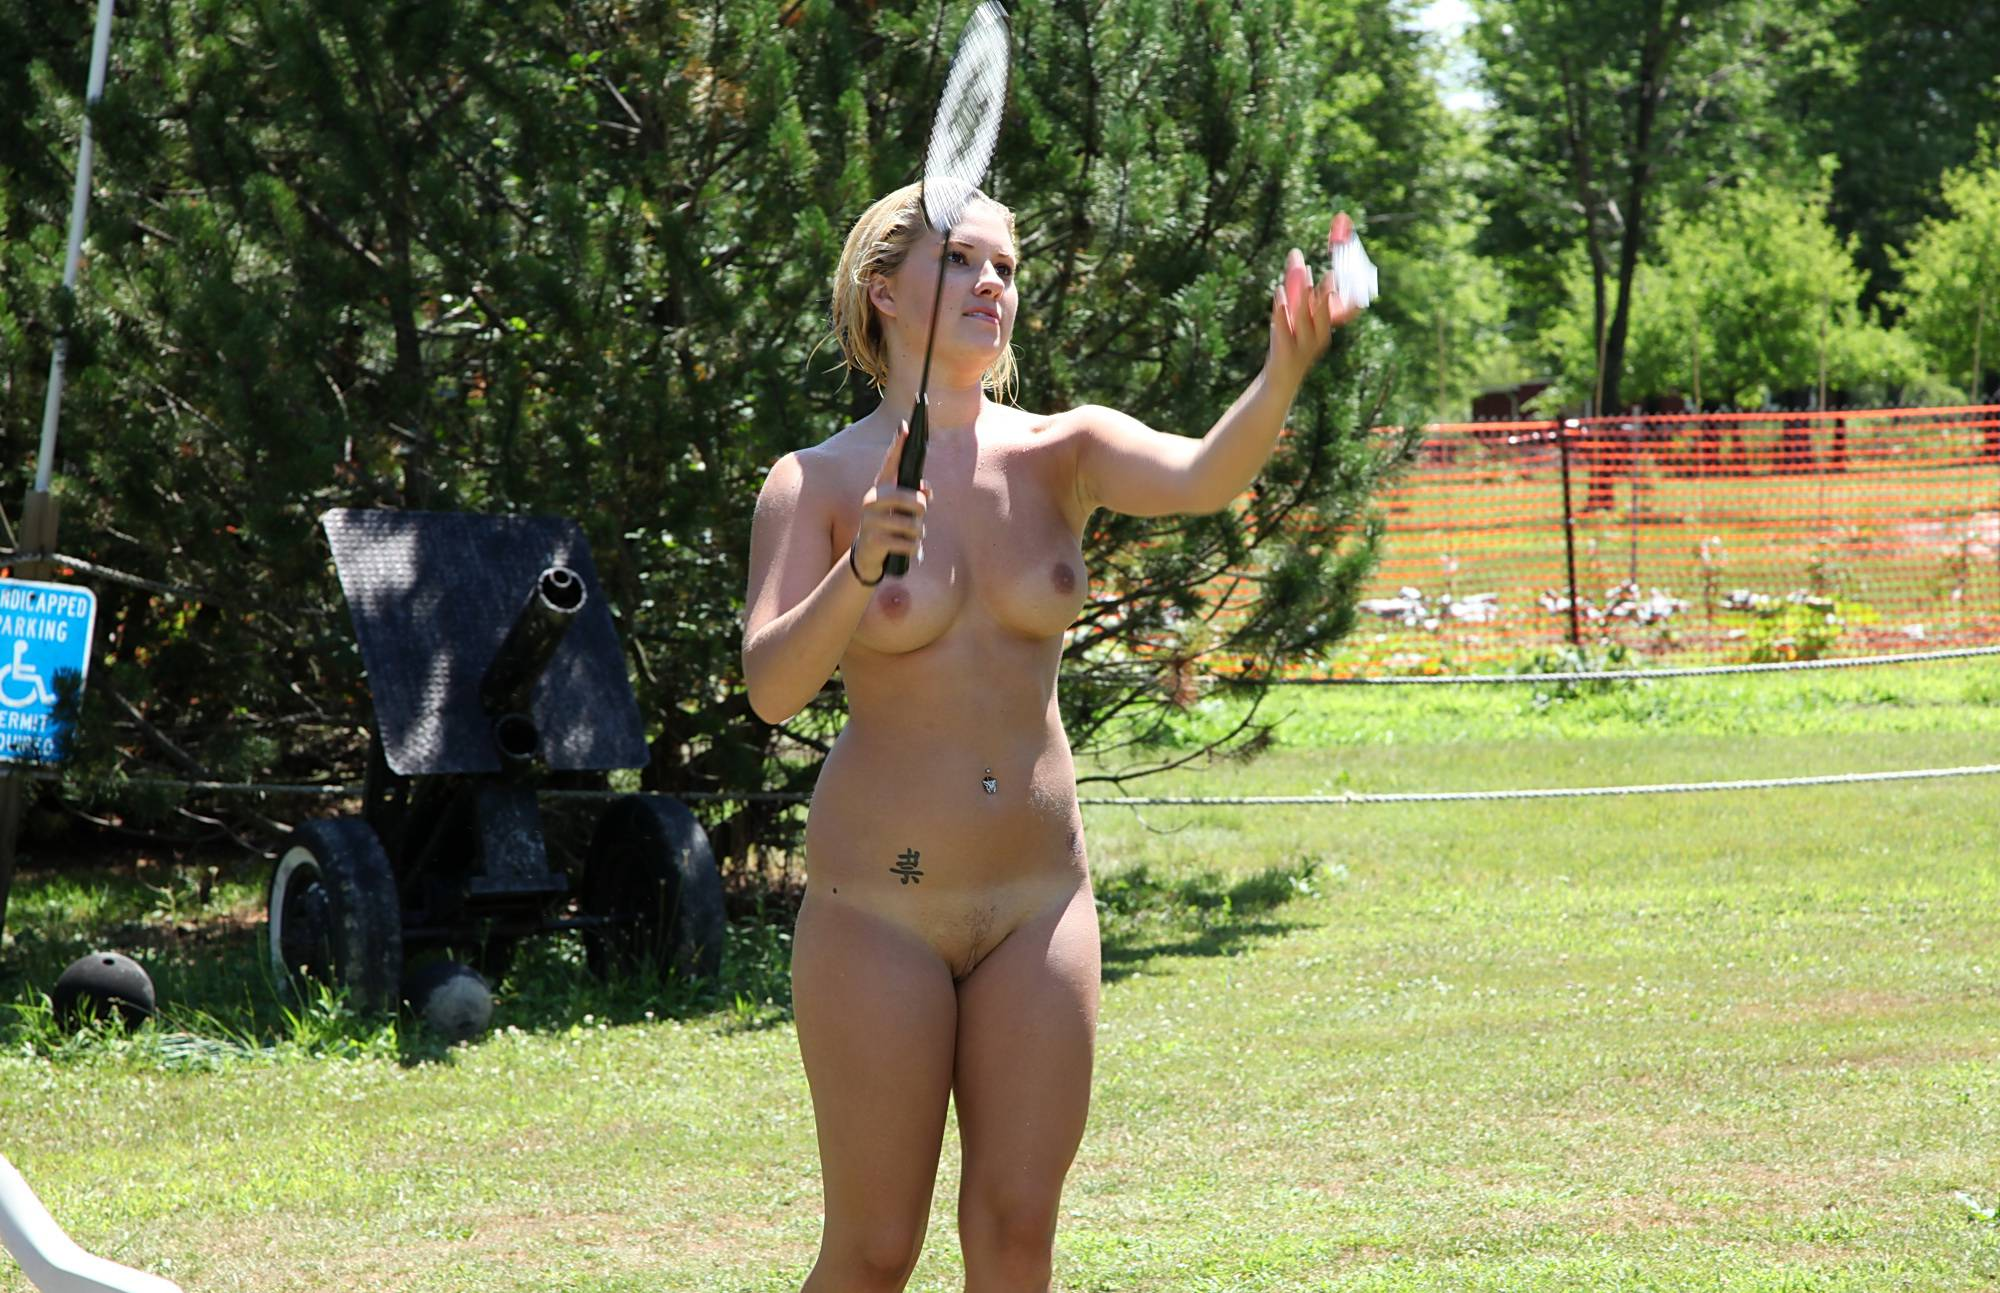 Pure Nudism Images Nudist Badminton Game - 1